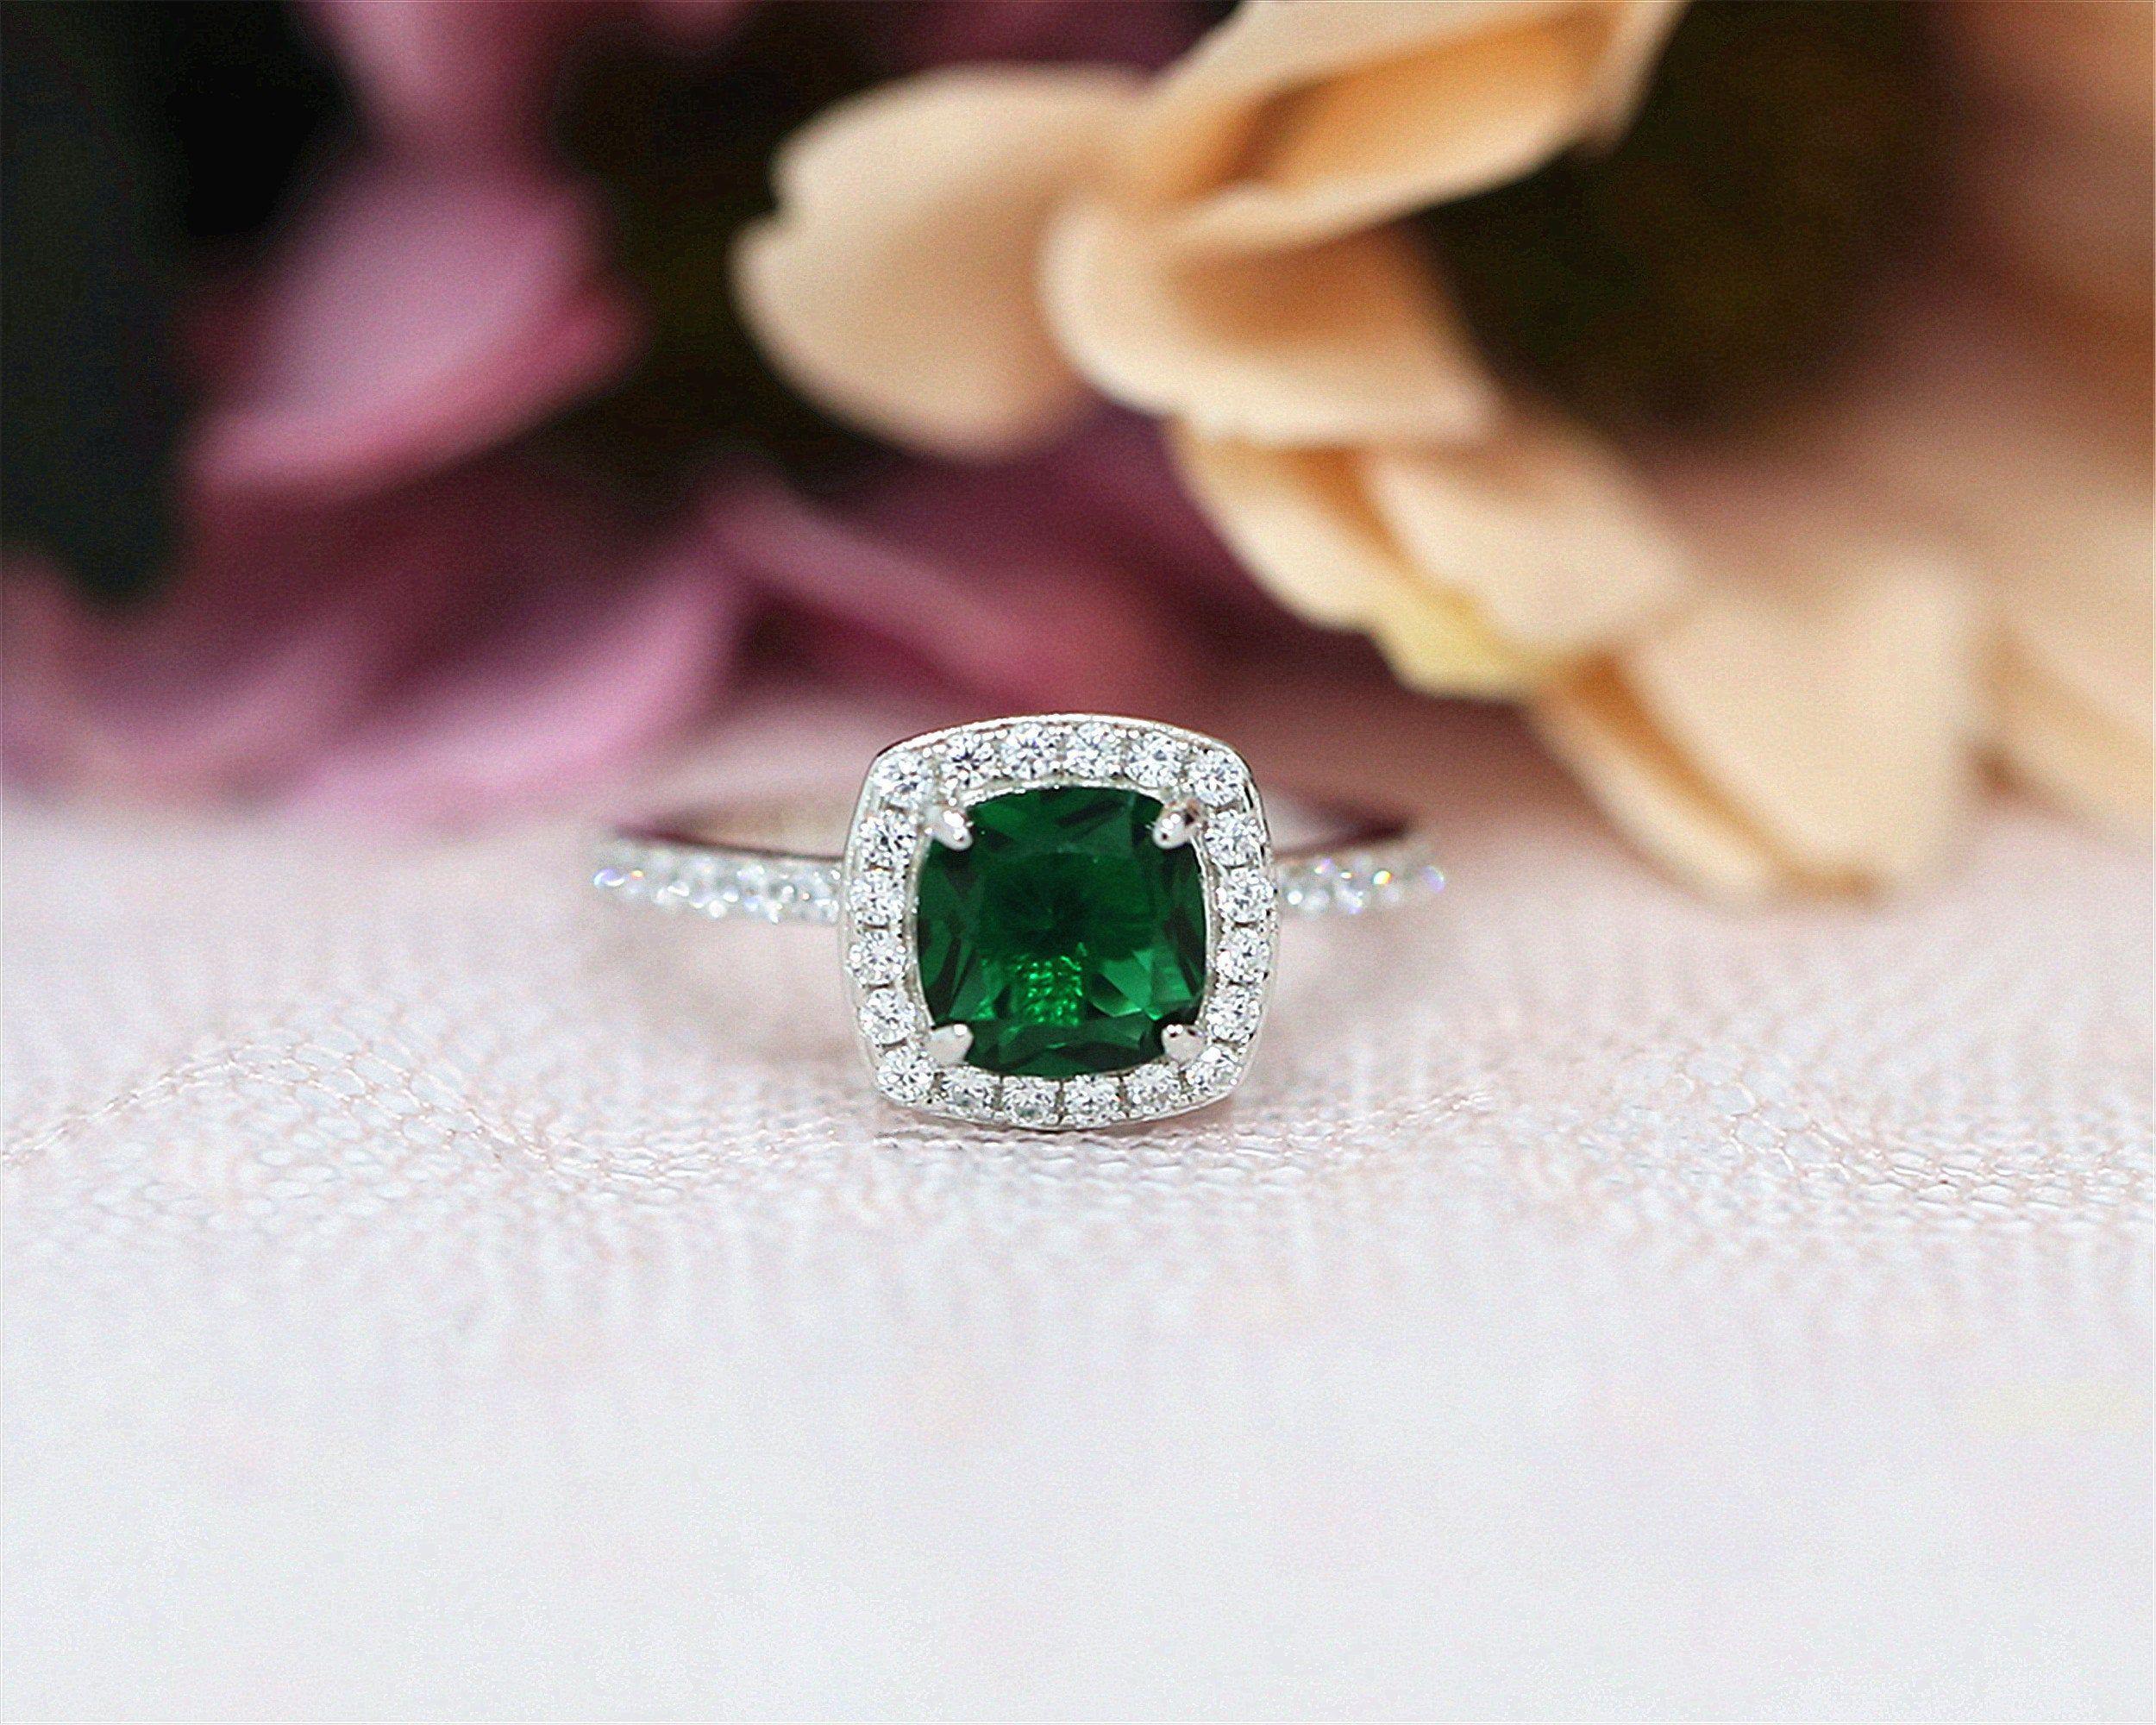 Lab Created Emerald 7*7mm Ring Cushion Cut Engagement Ring Handmade Sterling Silver Ring Gemstone Ring Bridal Ring